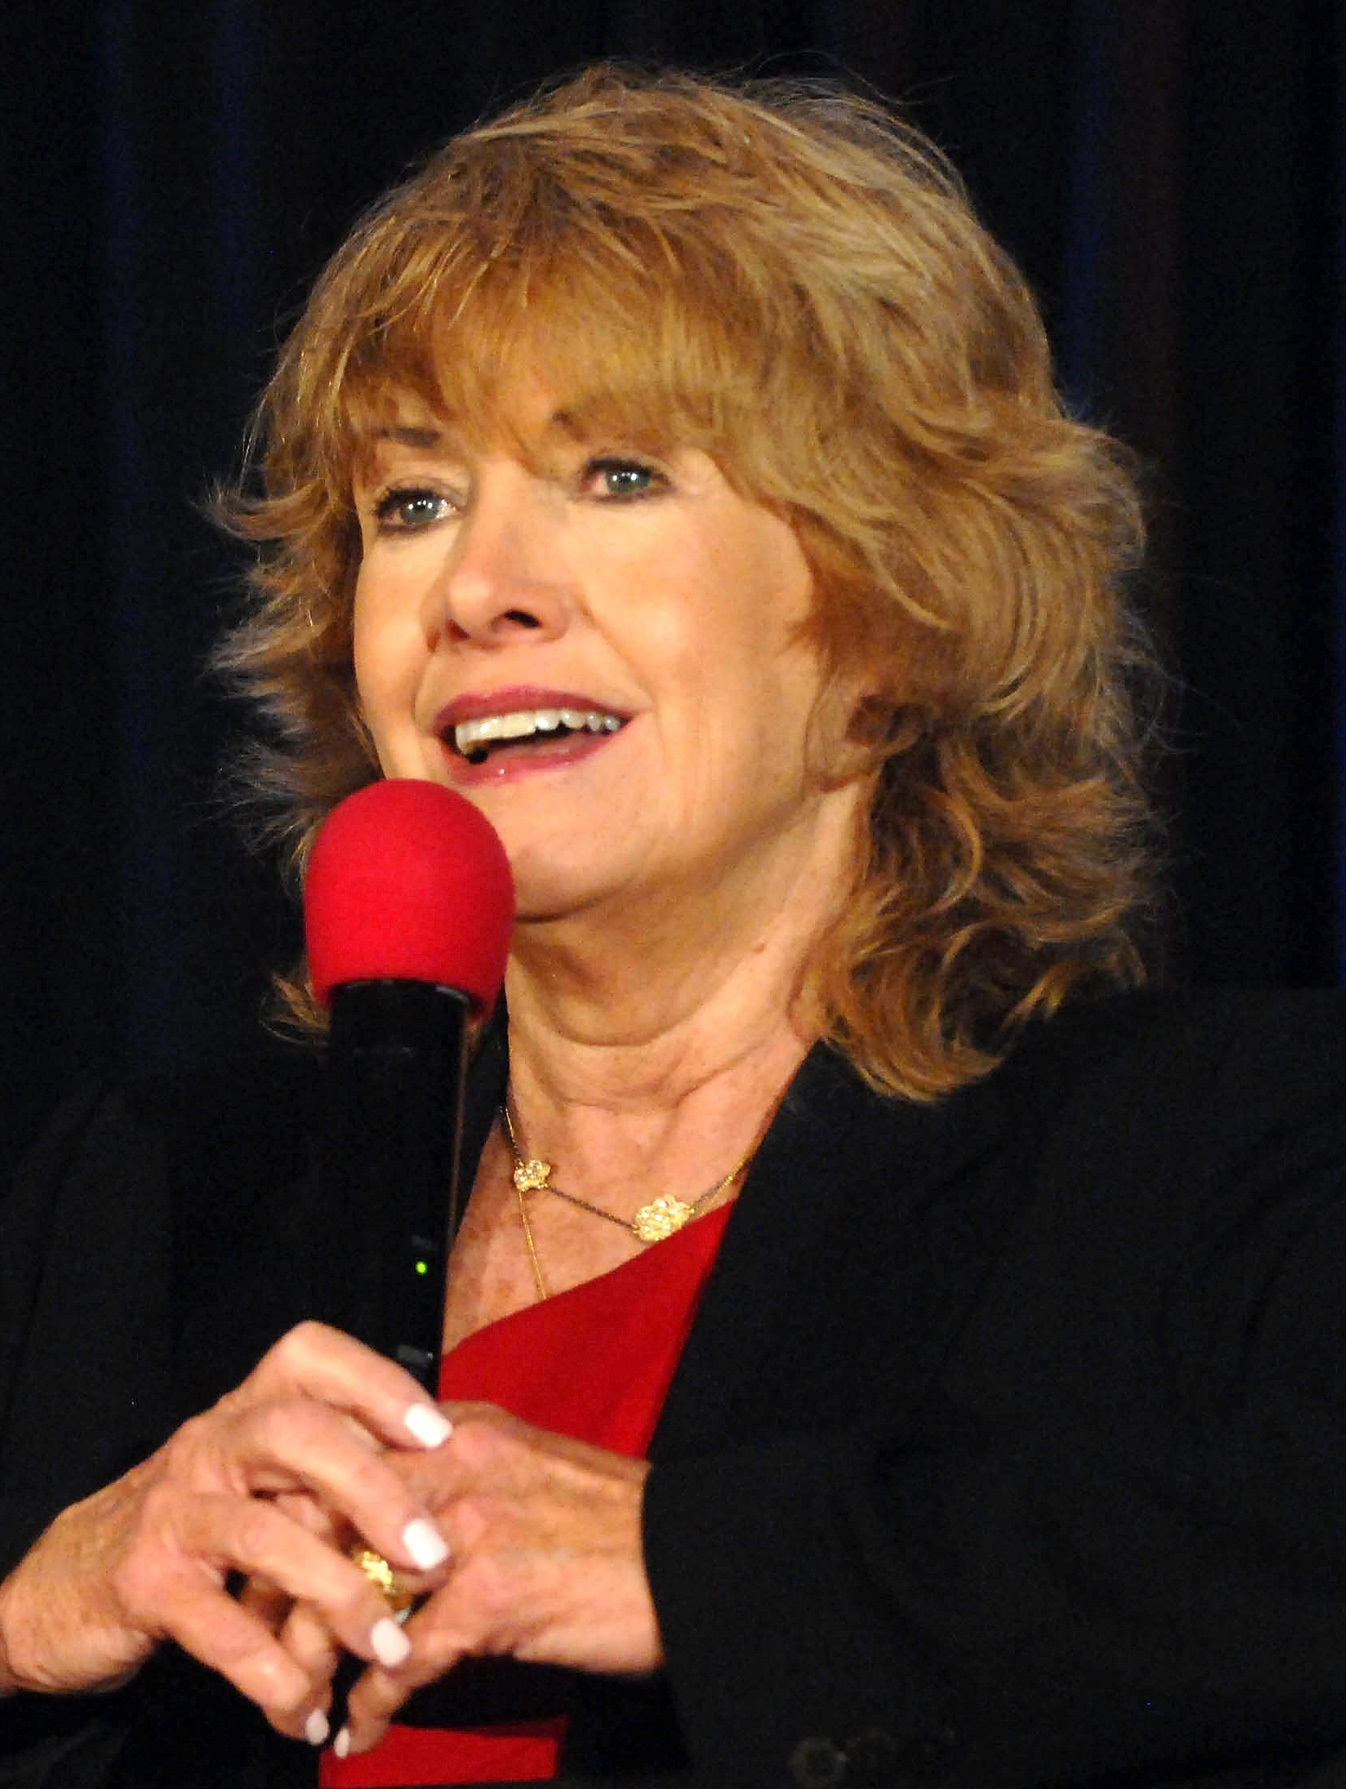 Catherine Hicks born August 6, 1951 (age 67)